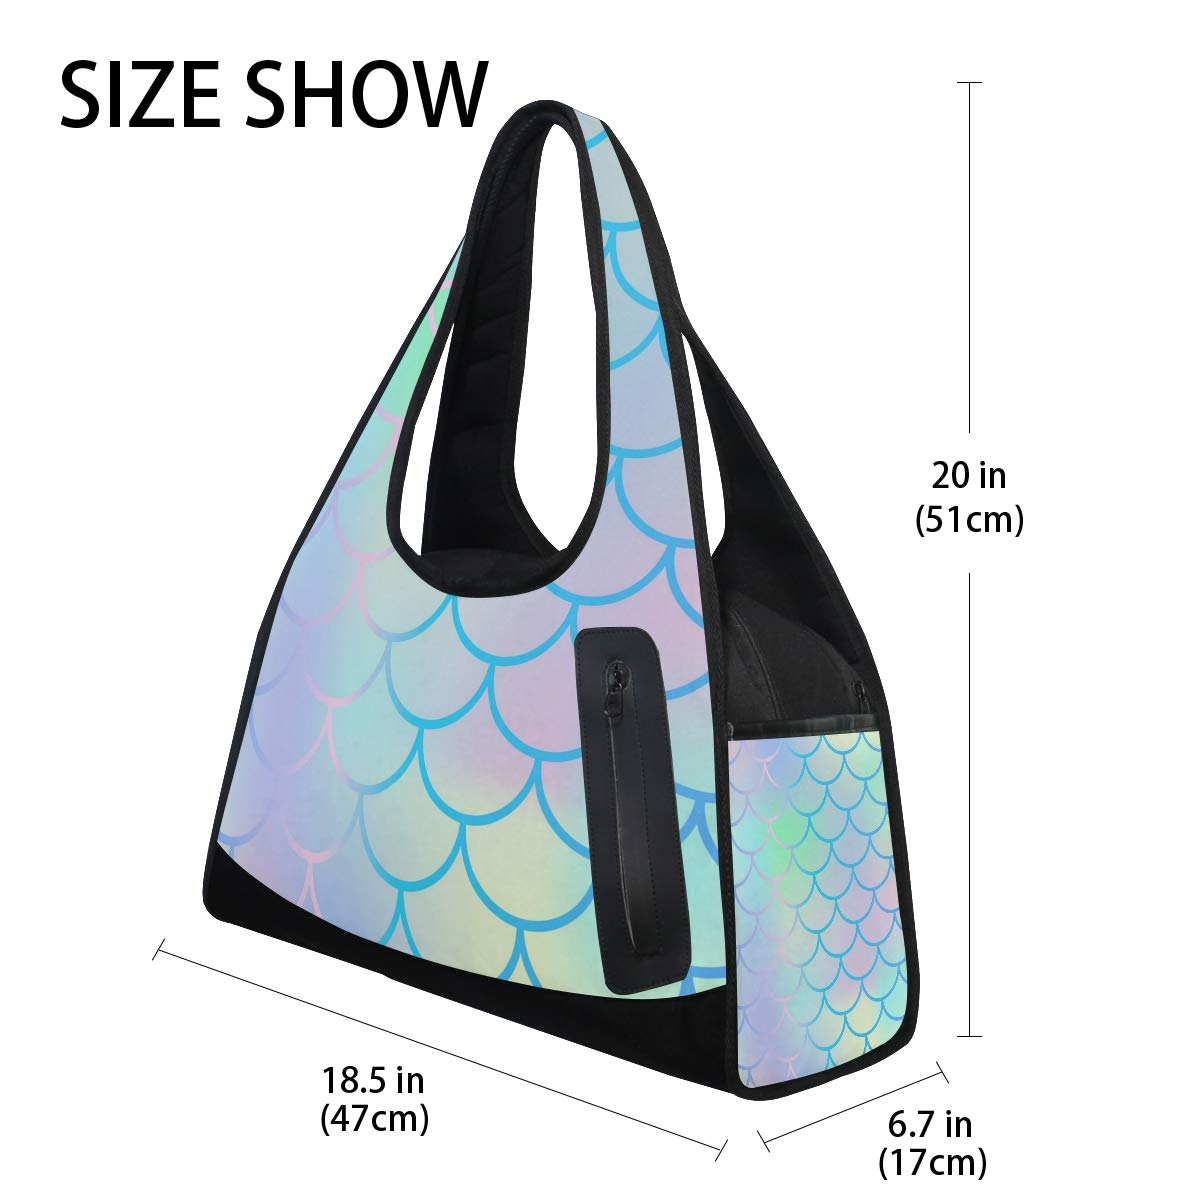 Colorful Mermaid Scals Women Sports Gym Totes Bag Multi-Function Nylon Travel Shoulder Bag